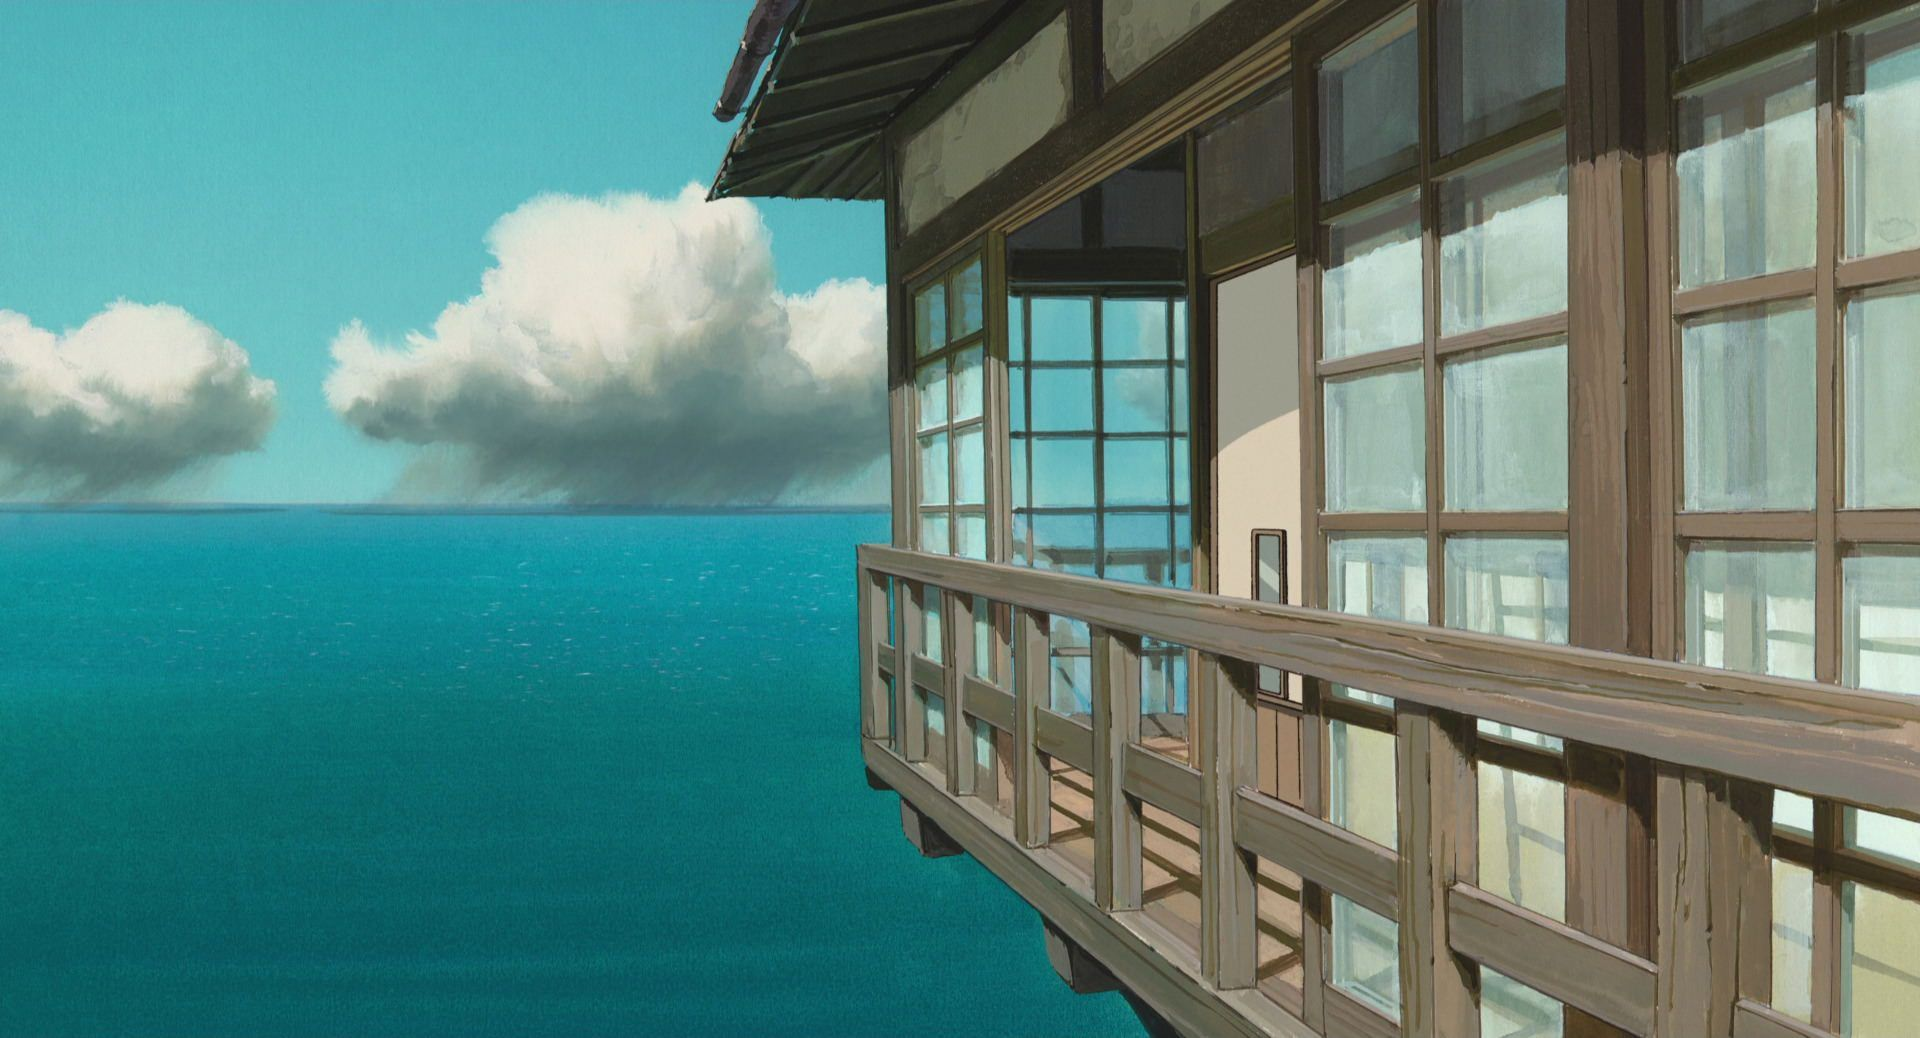 Spirited Away (2001) 1080p Animation Screencaps Studio